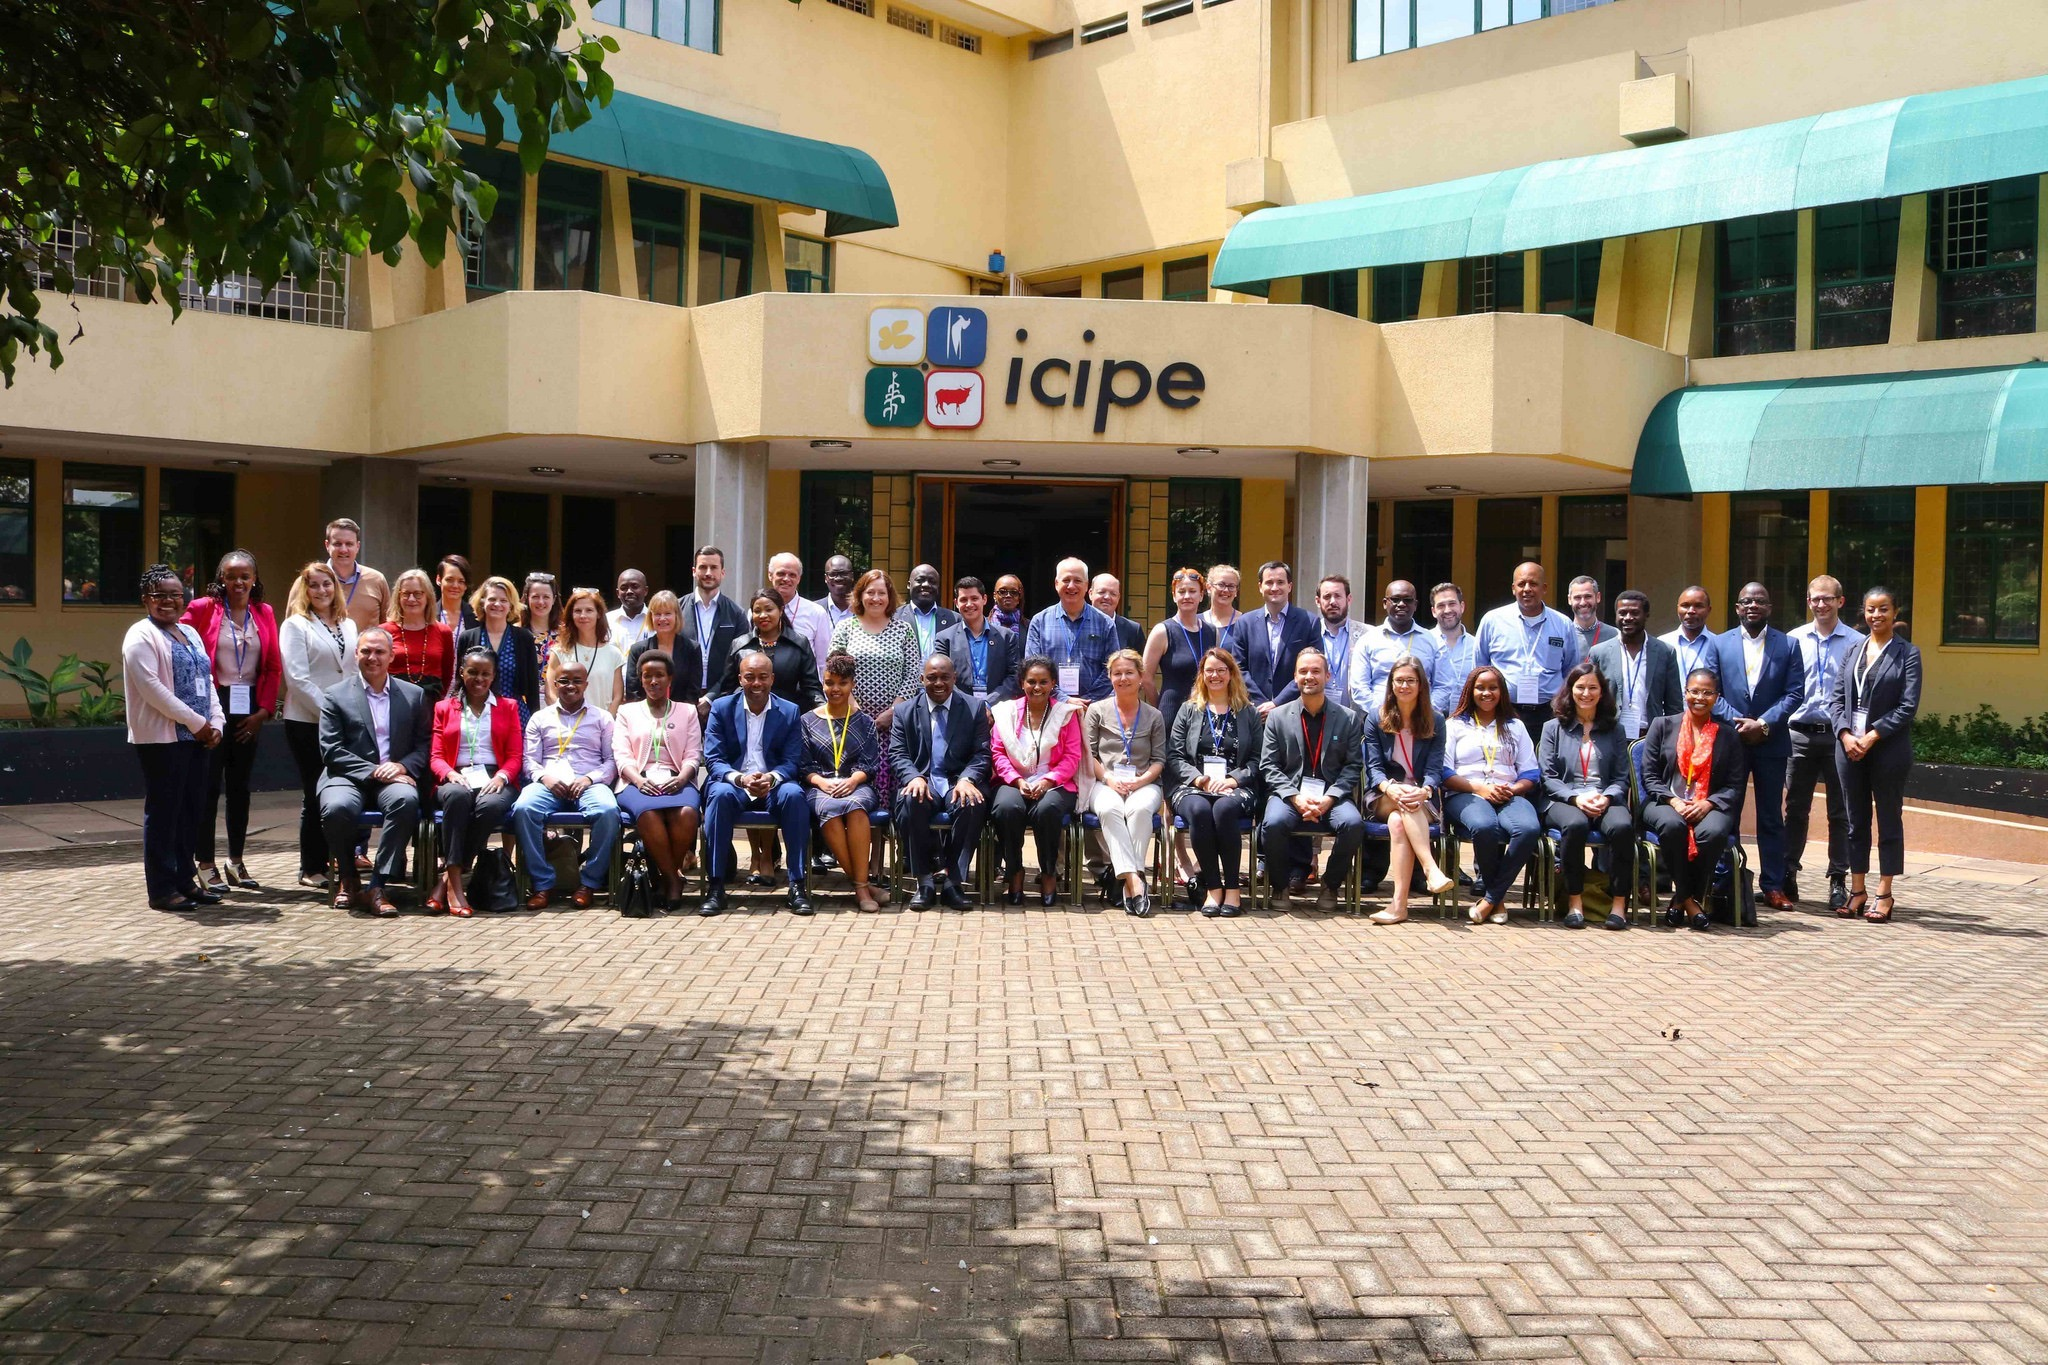 Photo credit: ICIPE